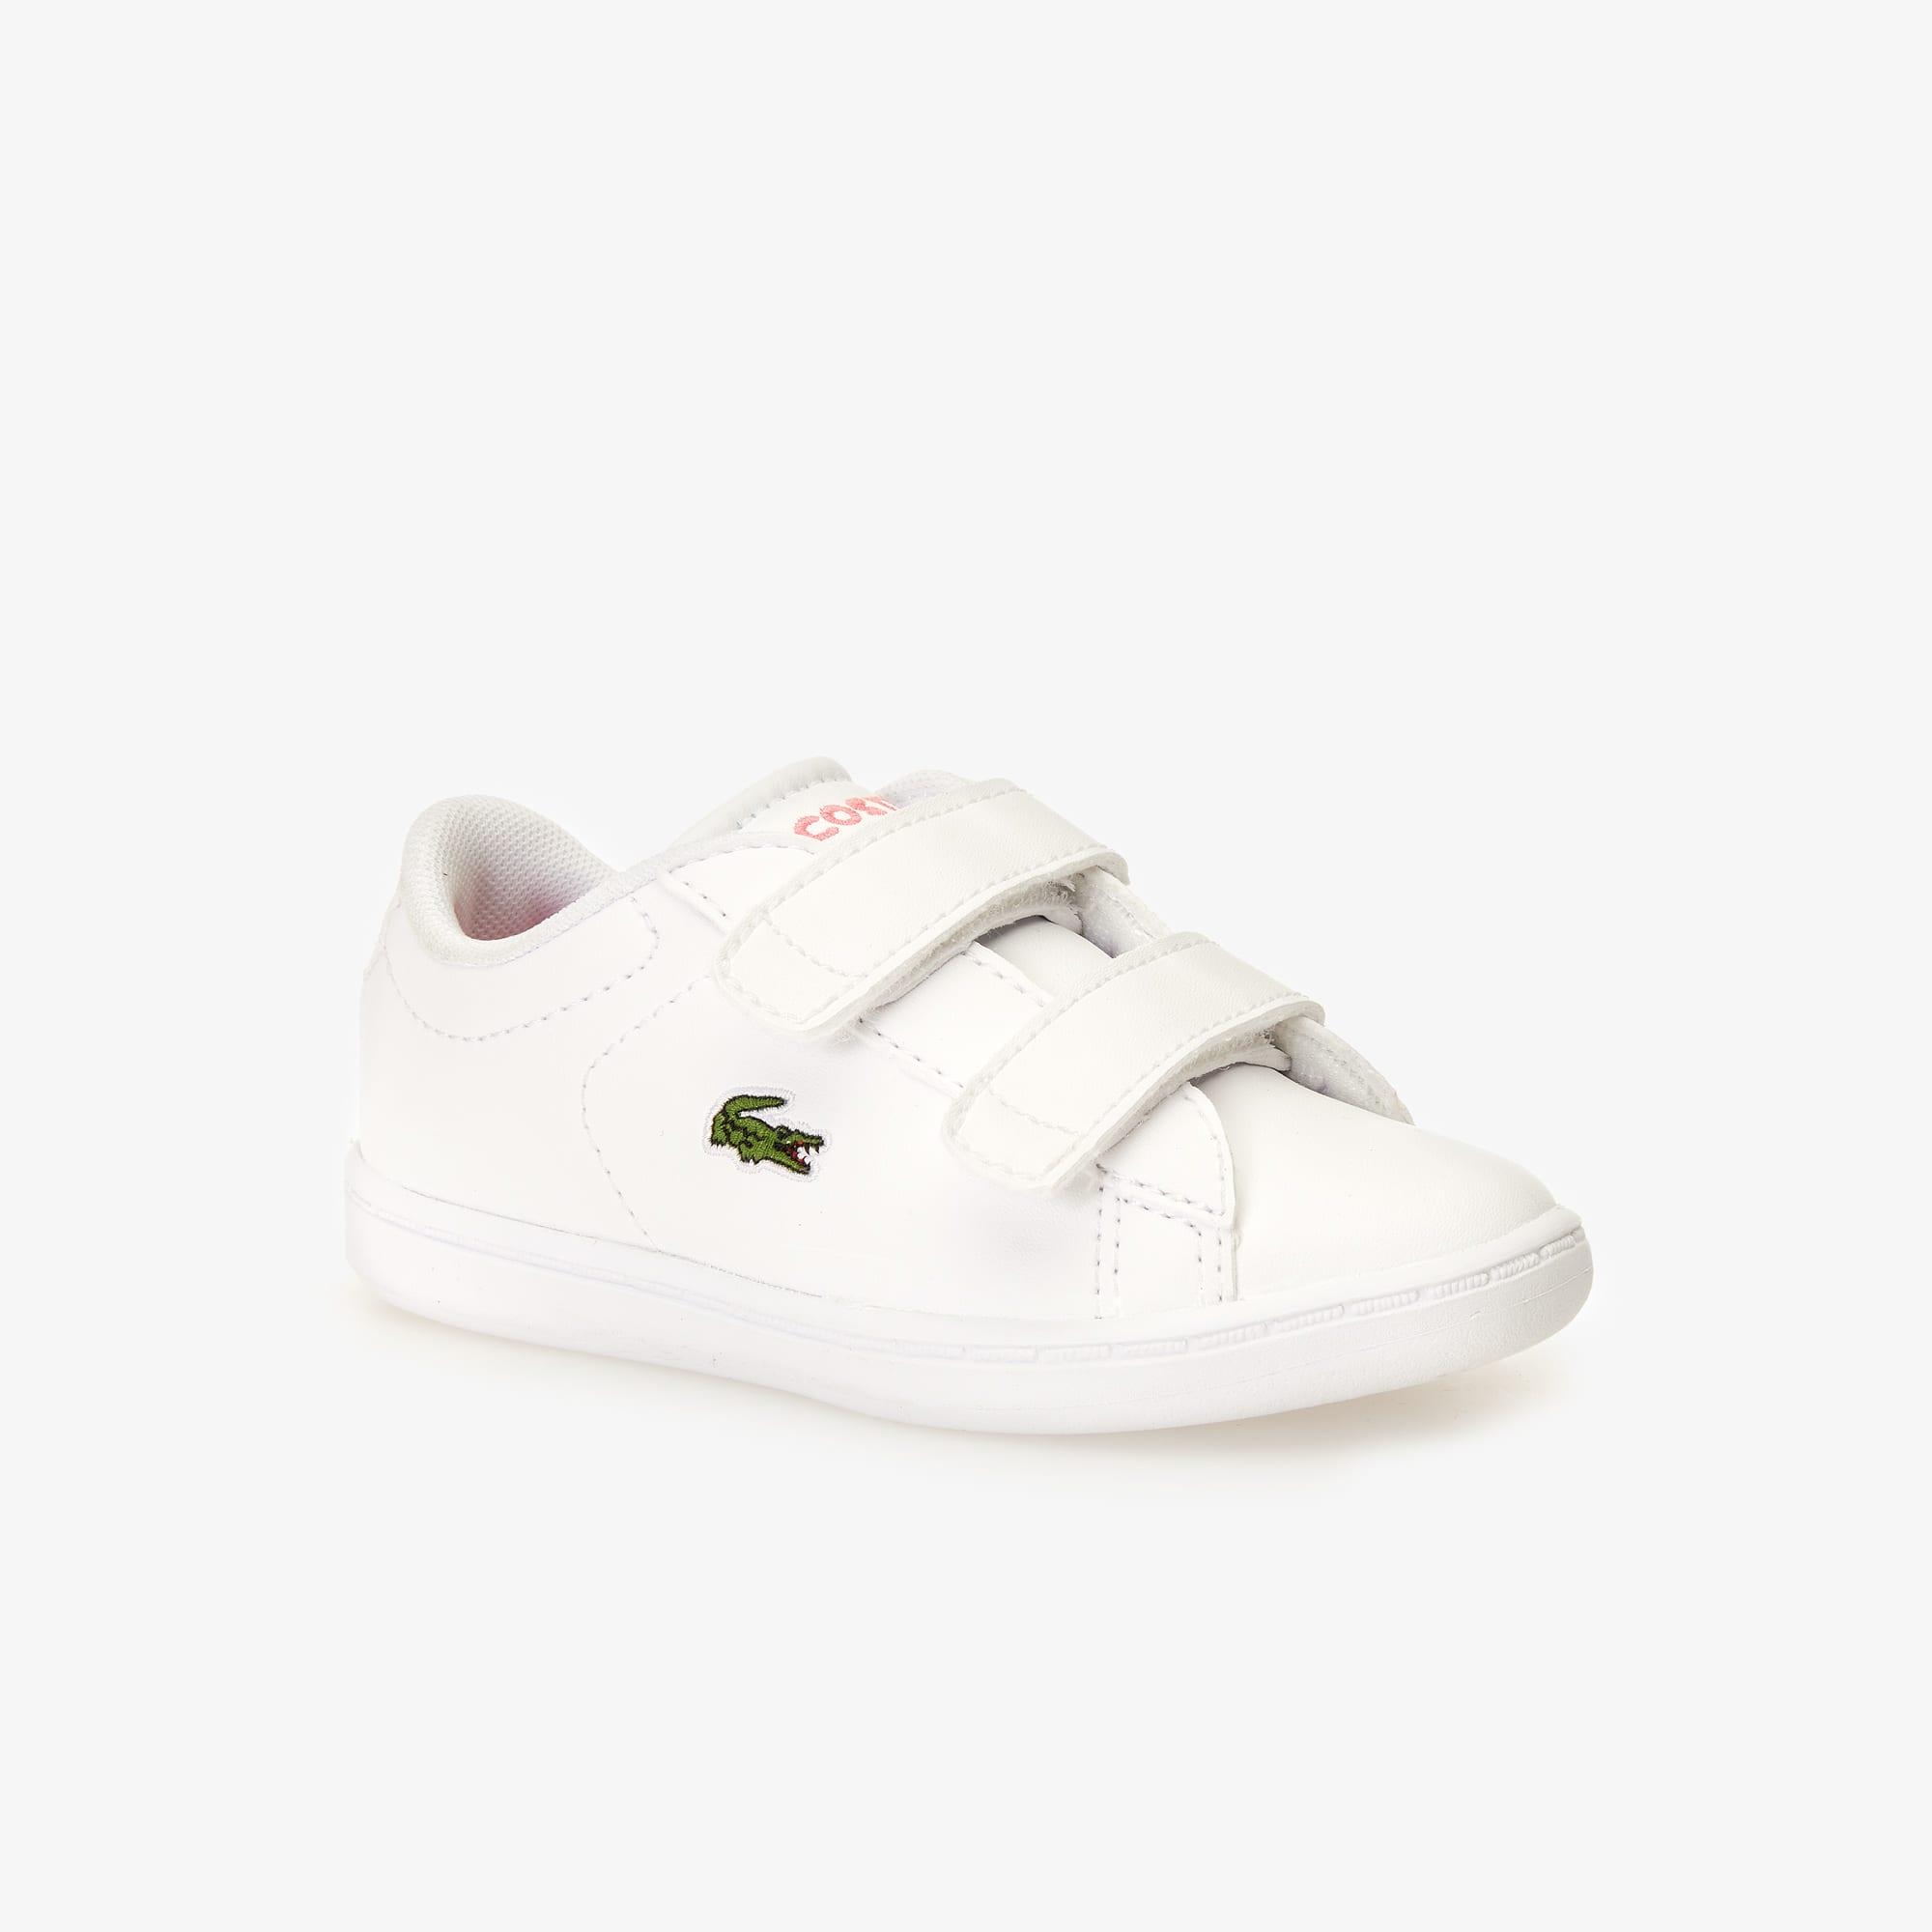 3a0bb27325 Sneakers Carnaby Evo bébé en synthétique avec crocodile vert